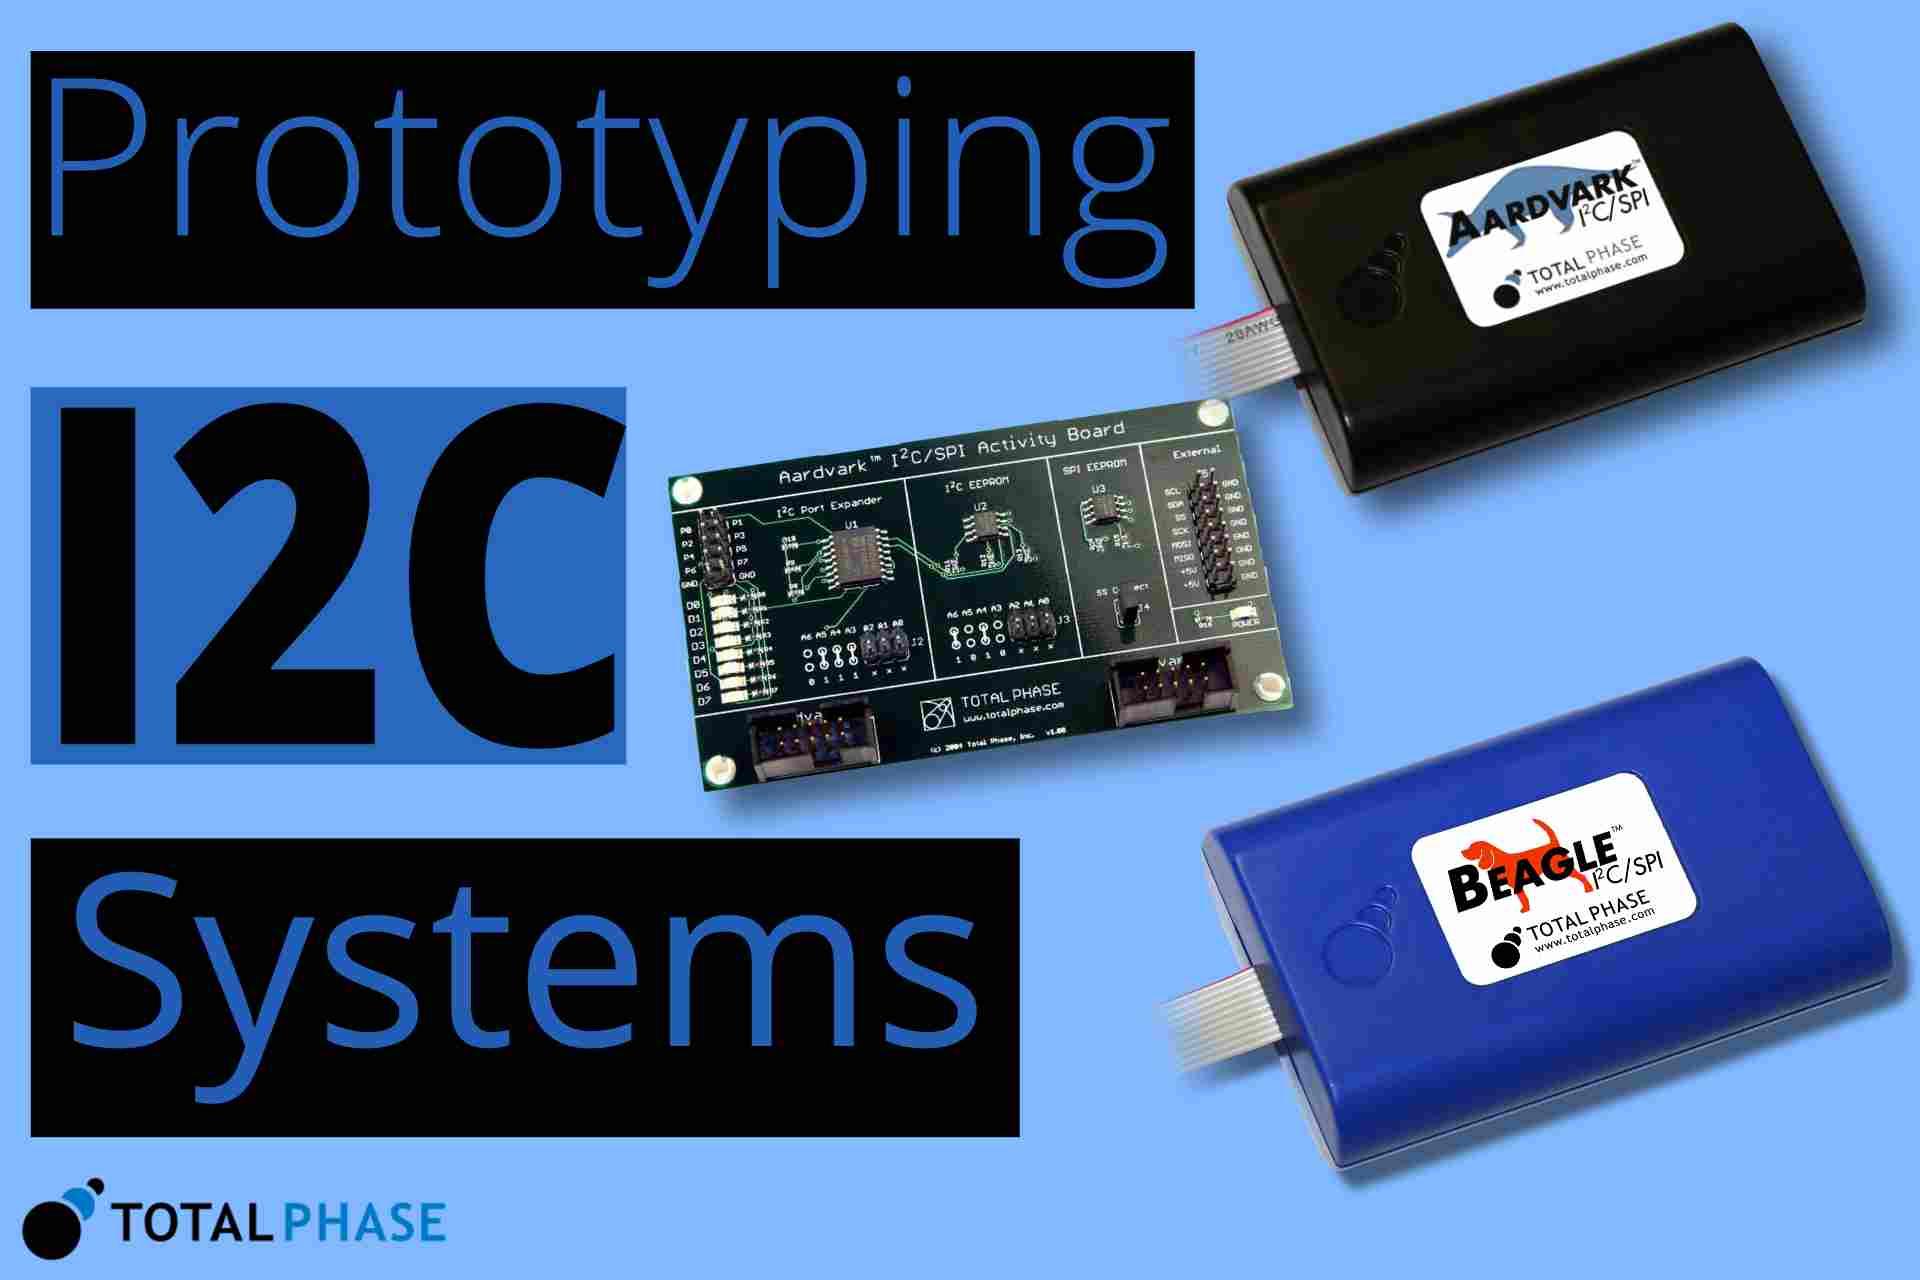 I2C System Prototyping